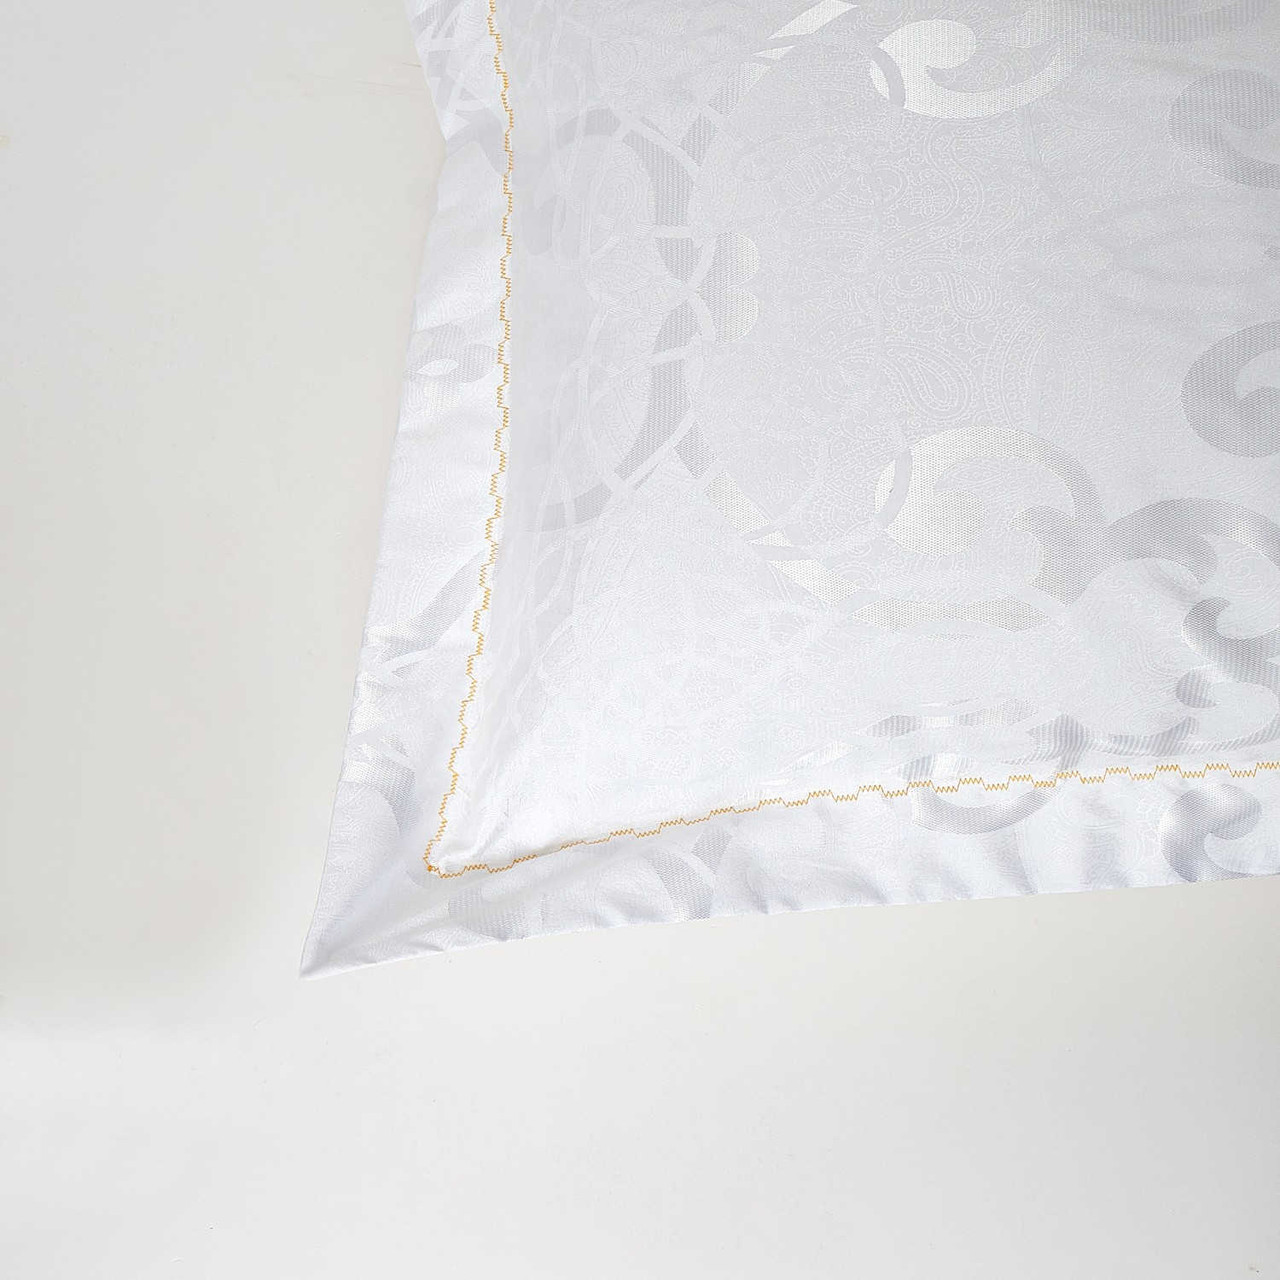 Jacquard Pillowcases DM806Q Dolce-Mela Bedding Wholesale-Dropship